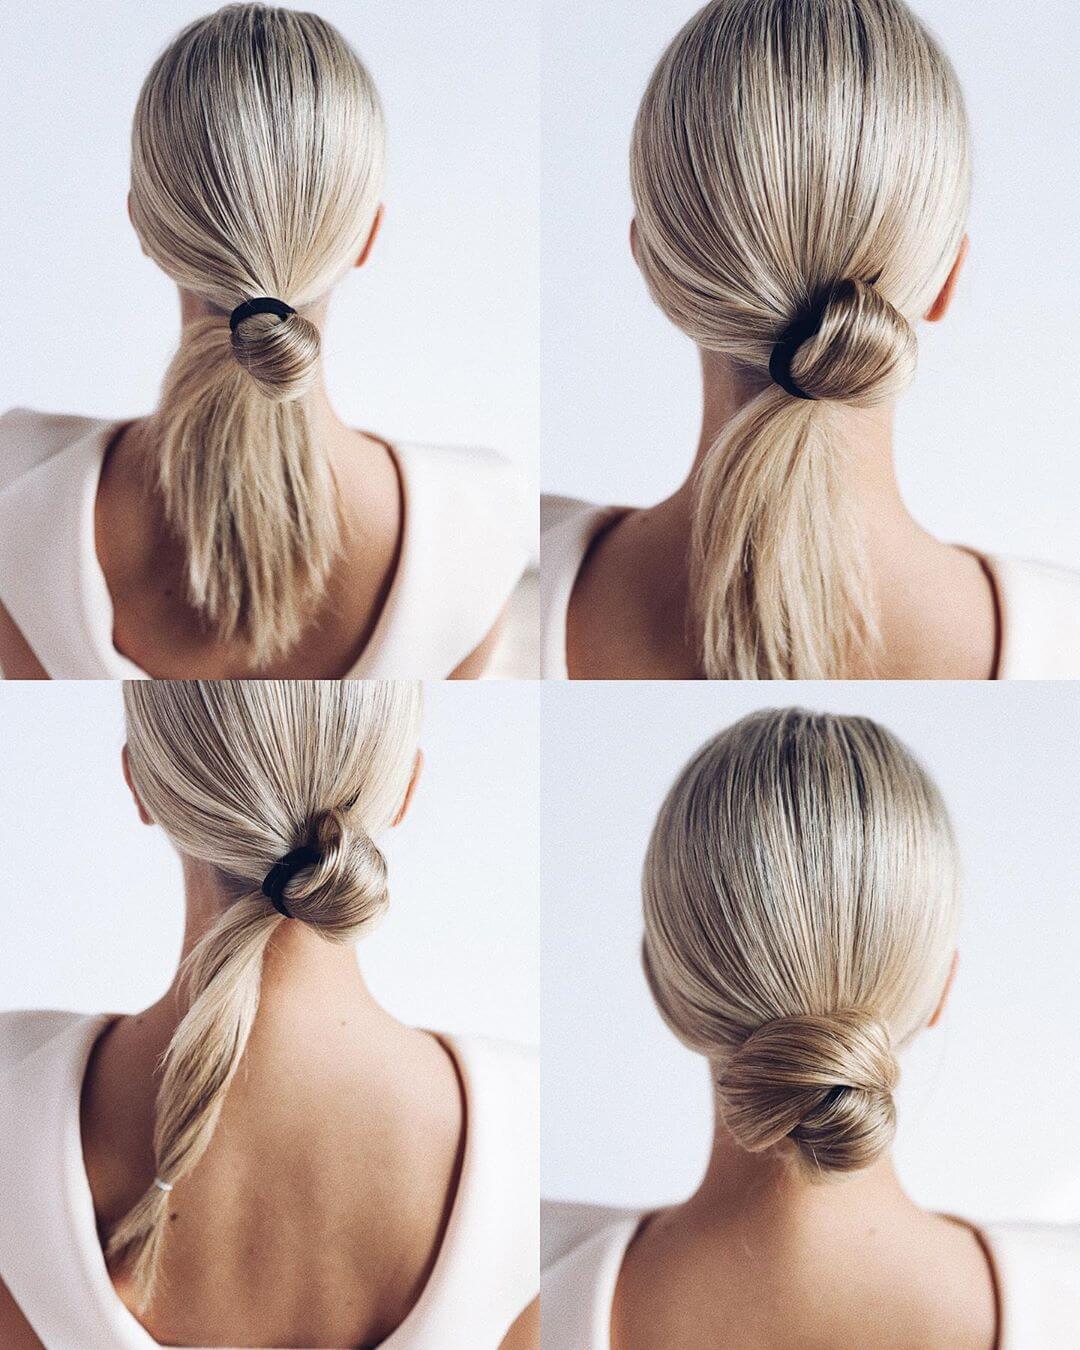 Step by Step Super simple lower bun Hairstyles for Long, Medium, Short Hair